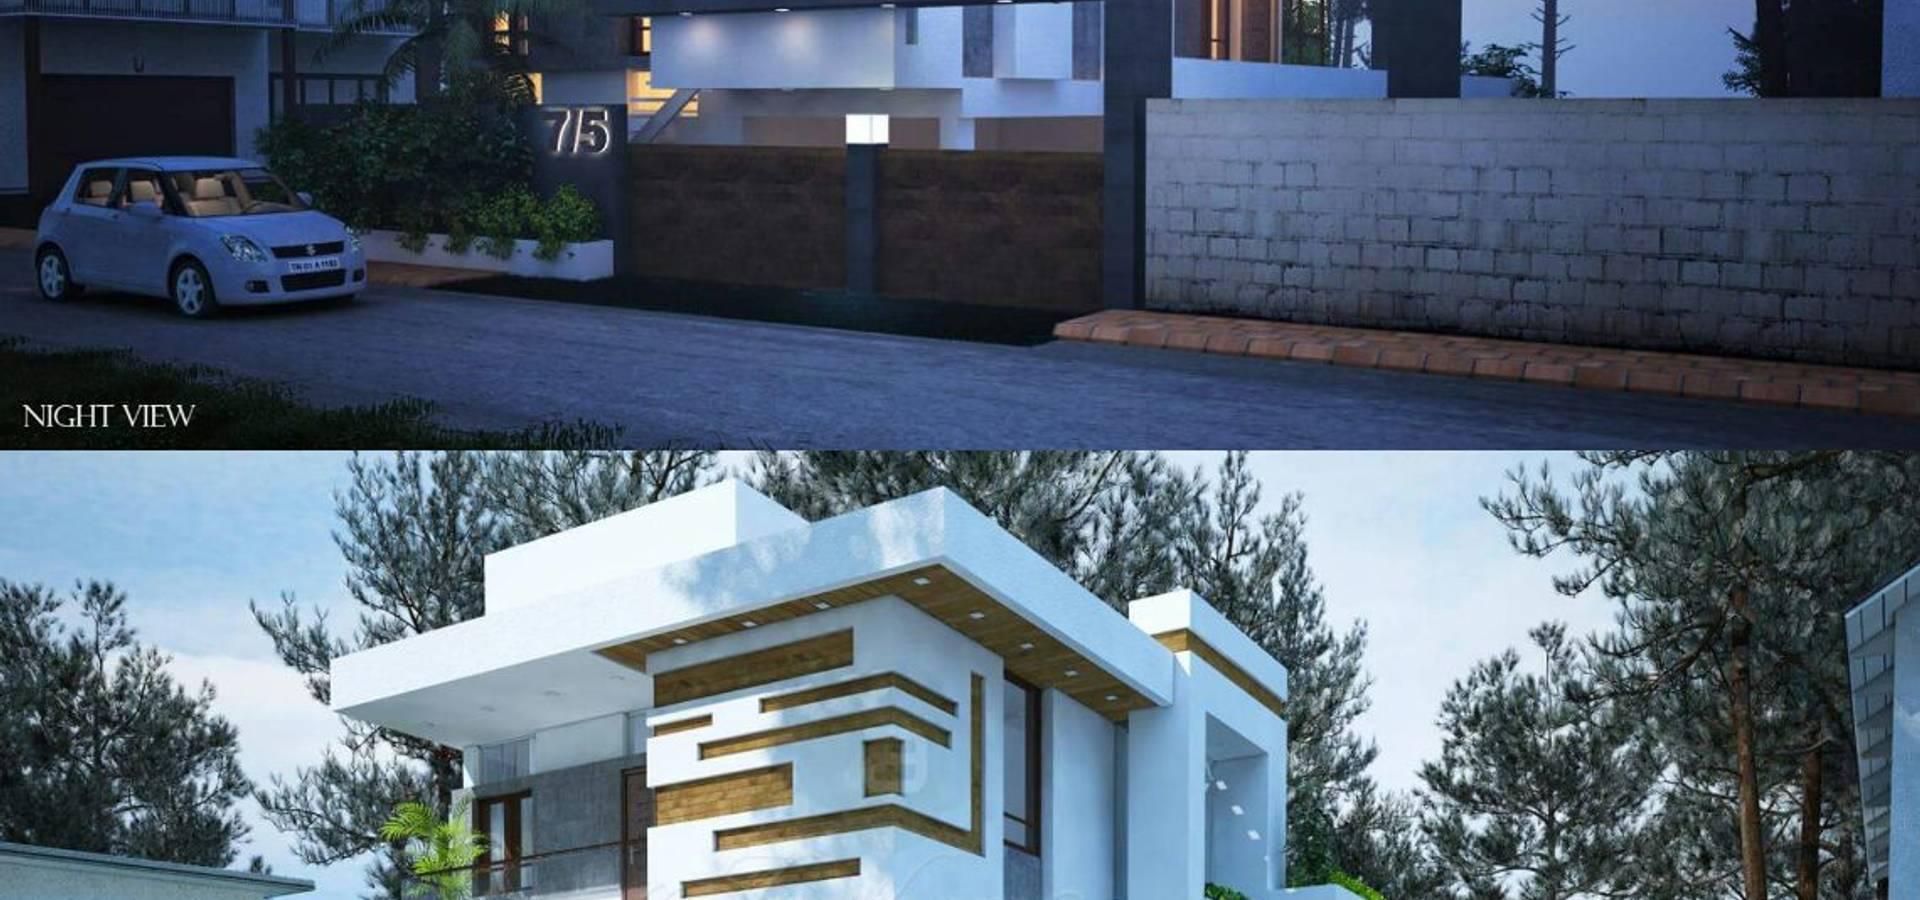 Anutham Architecture studio